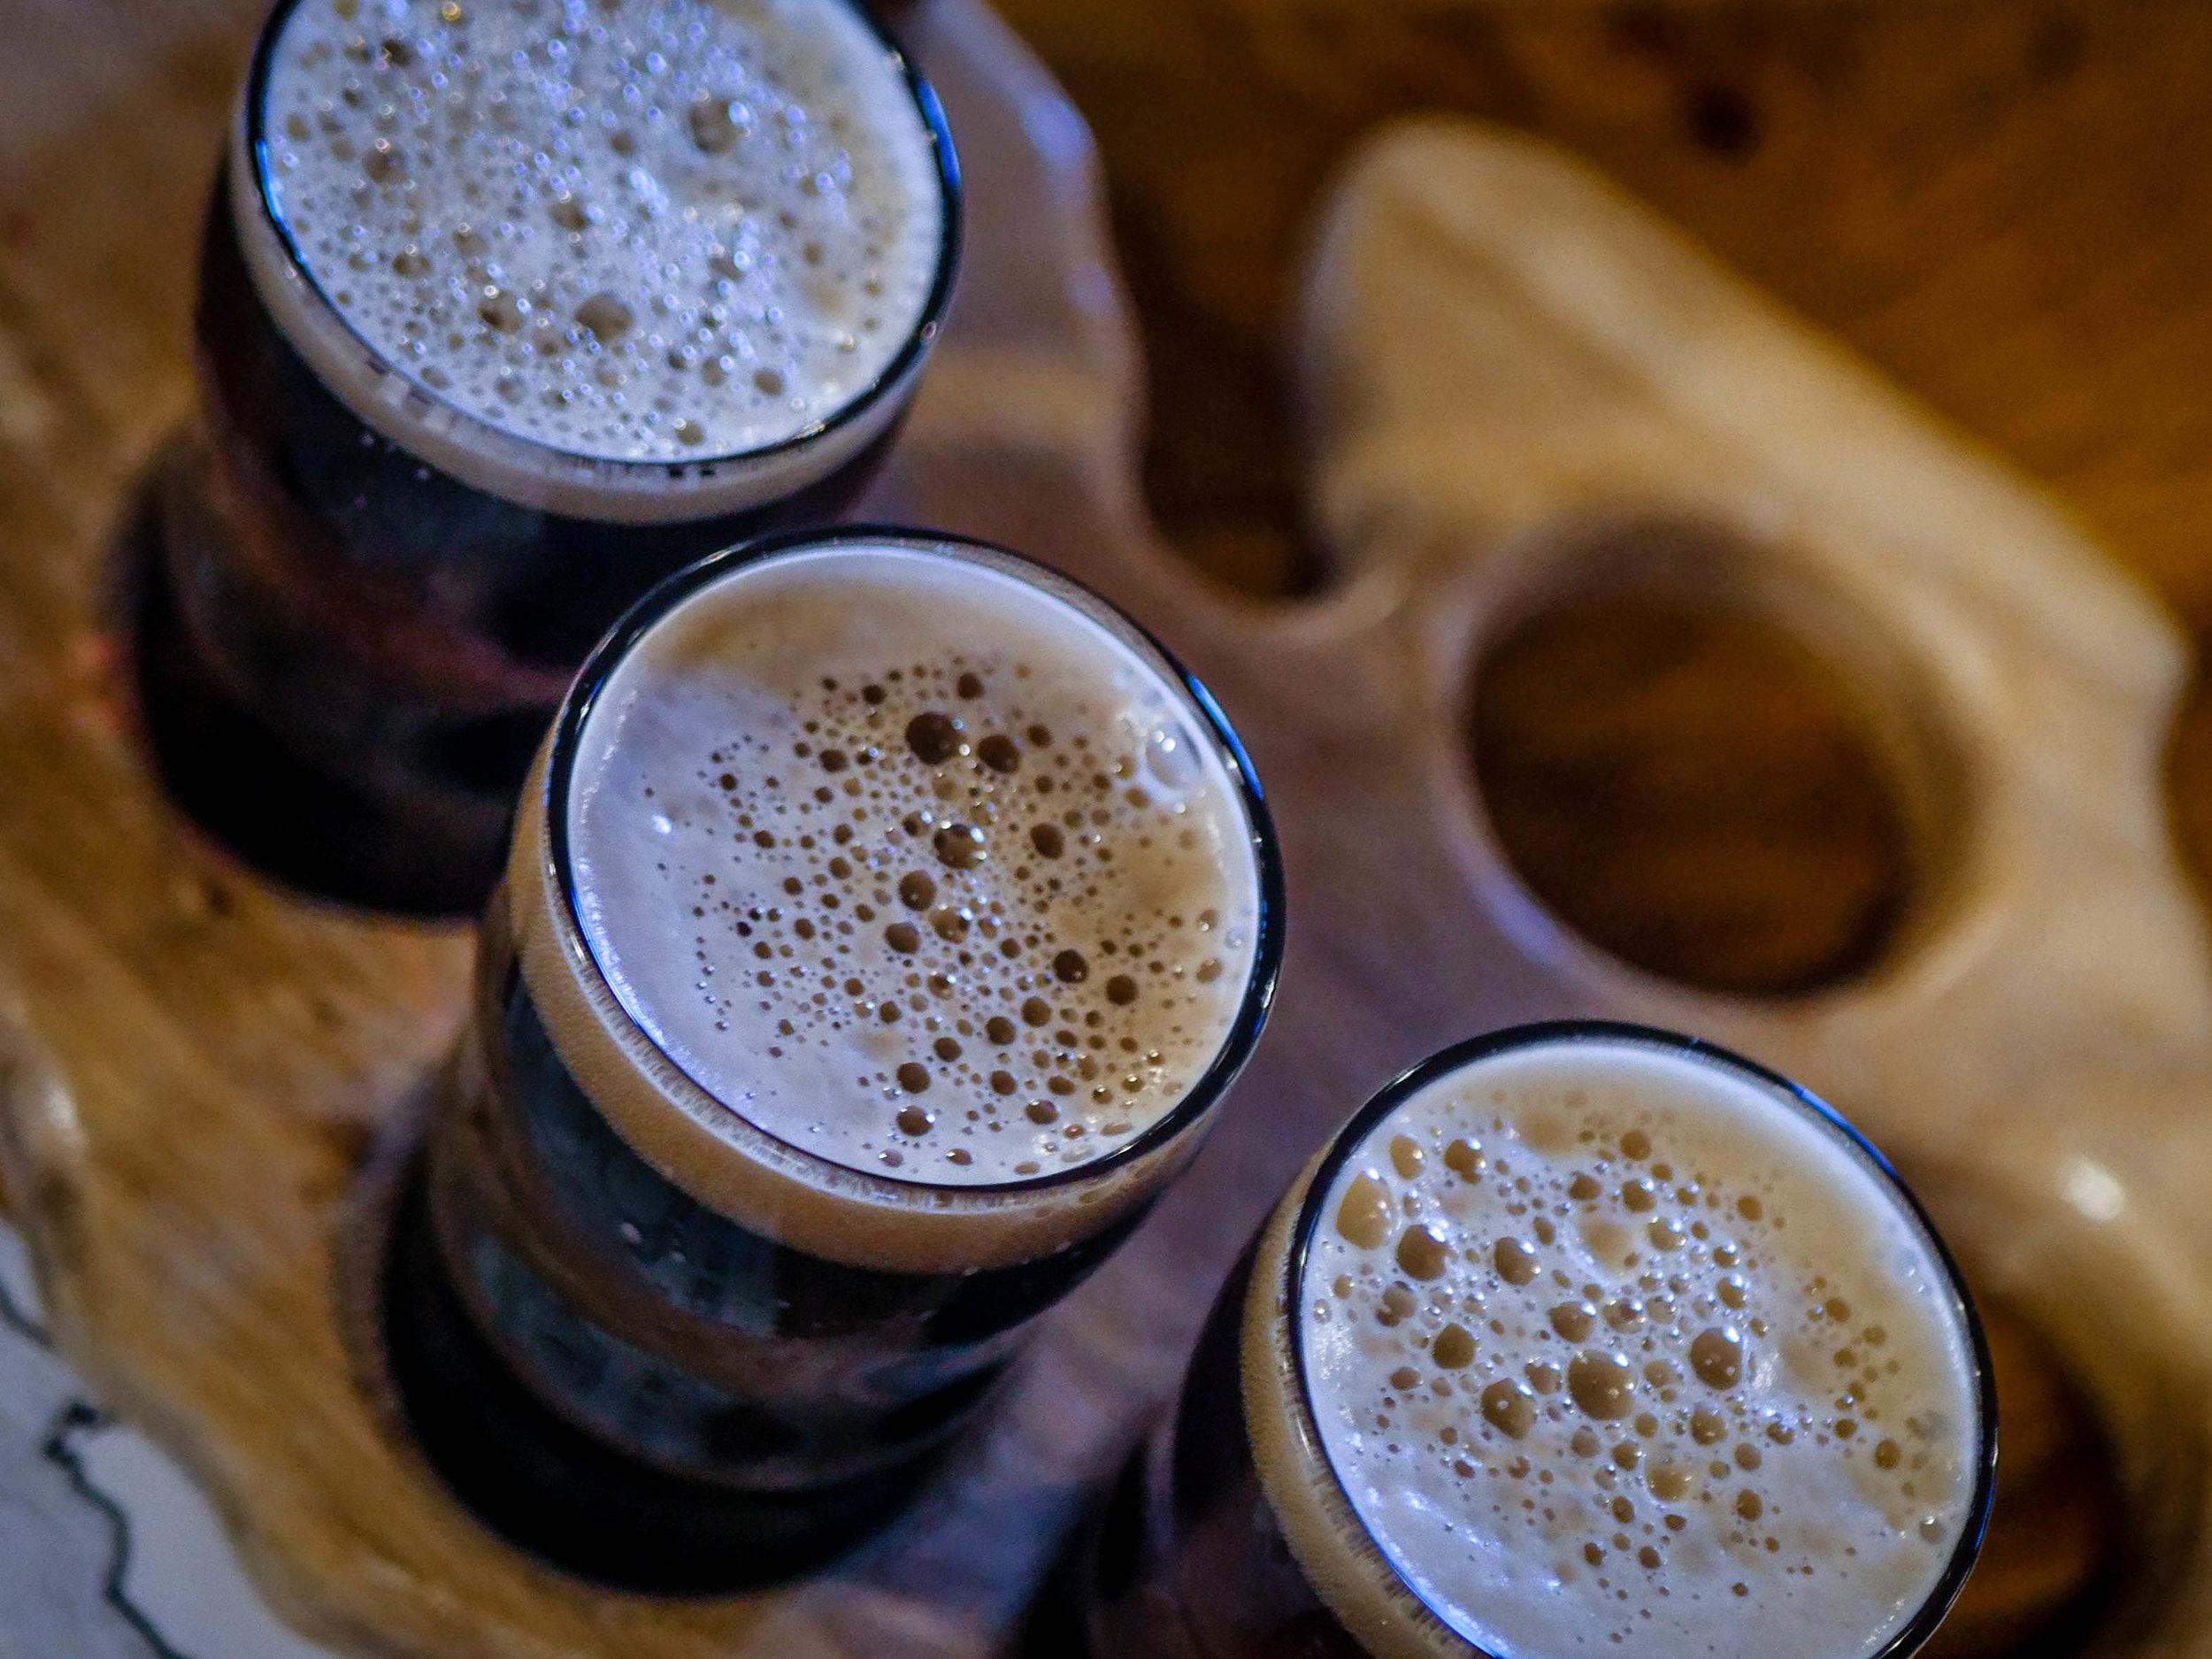 Beer flight from Mitten Brewing Company